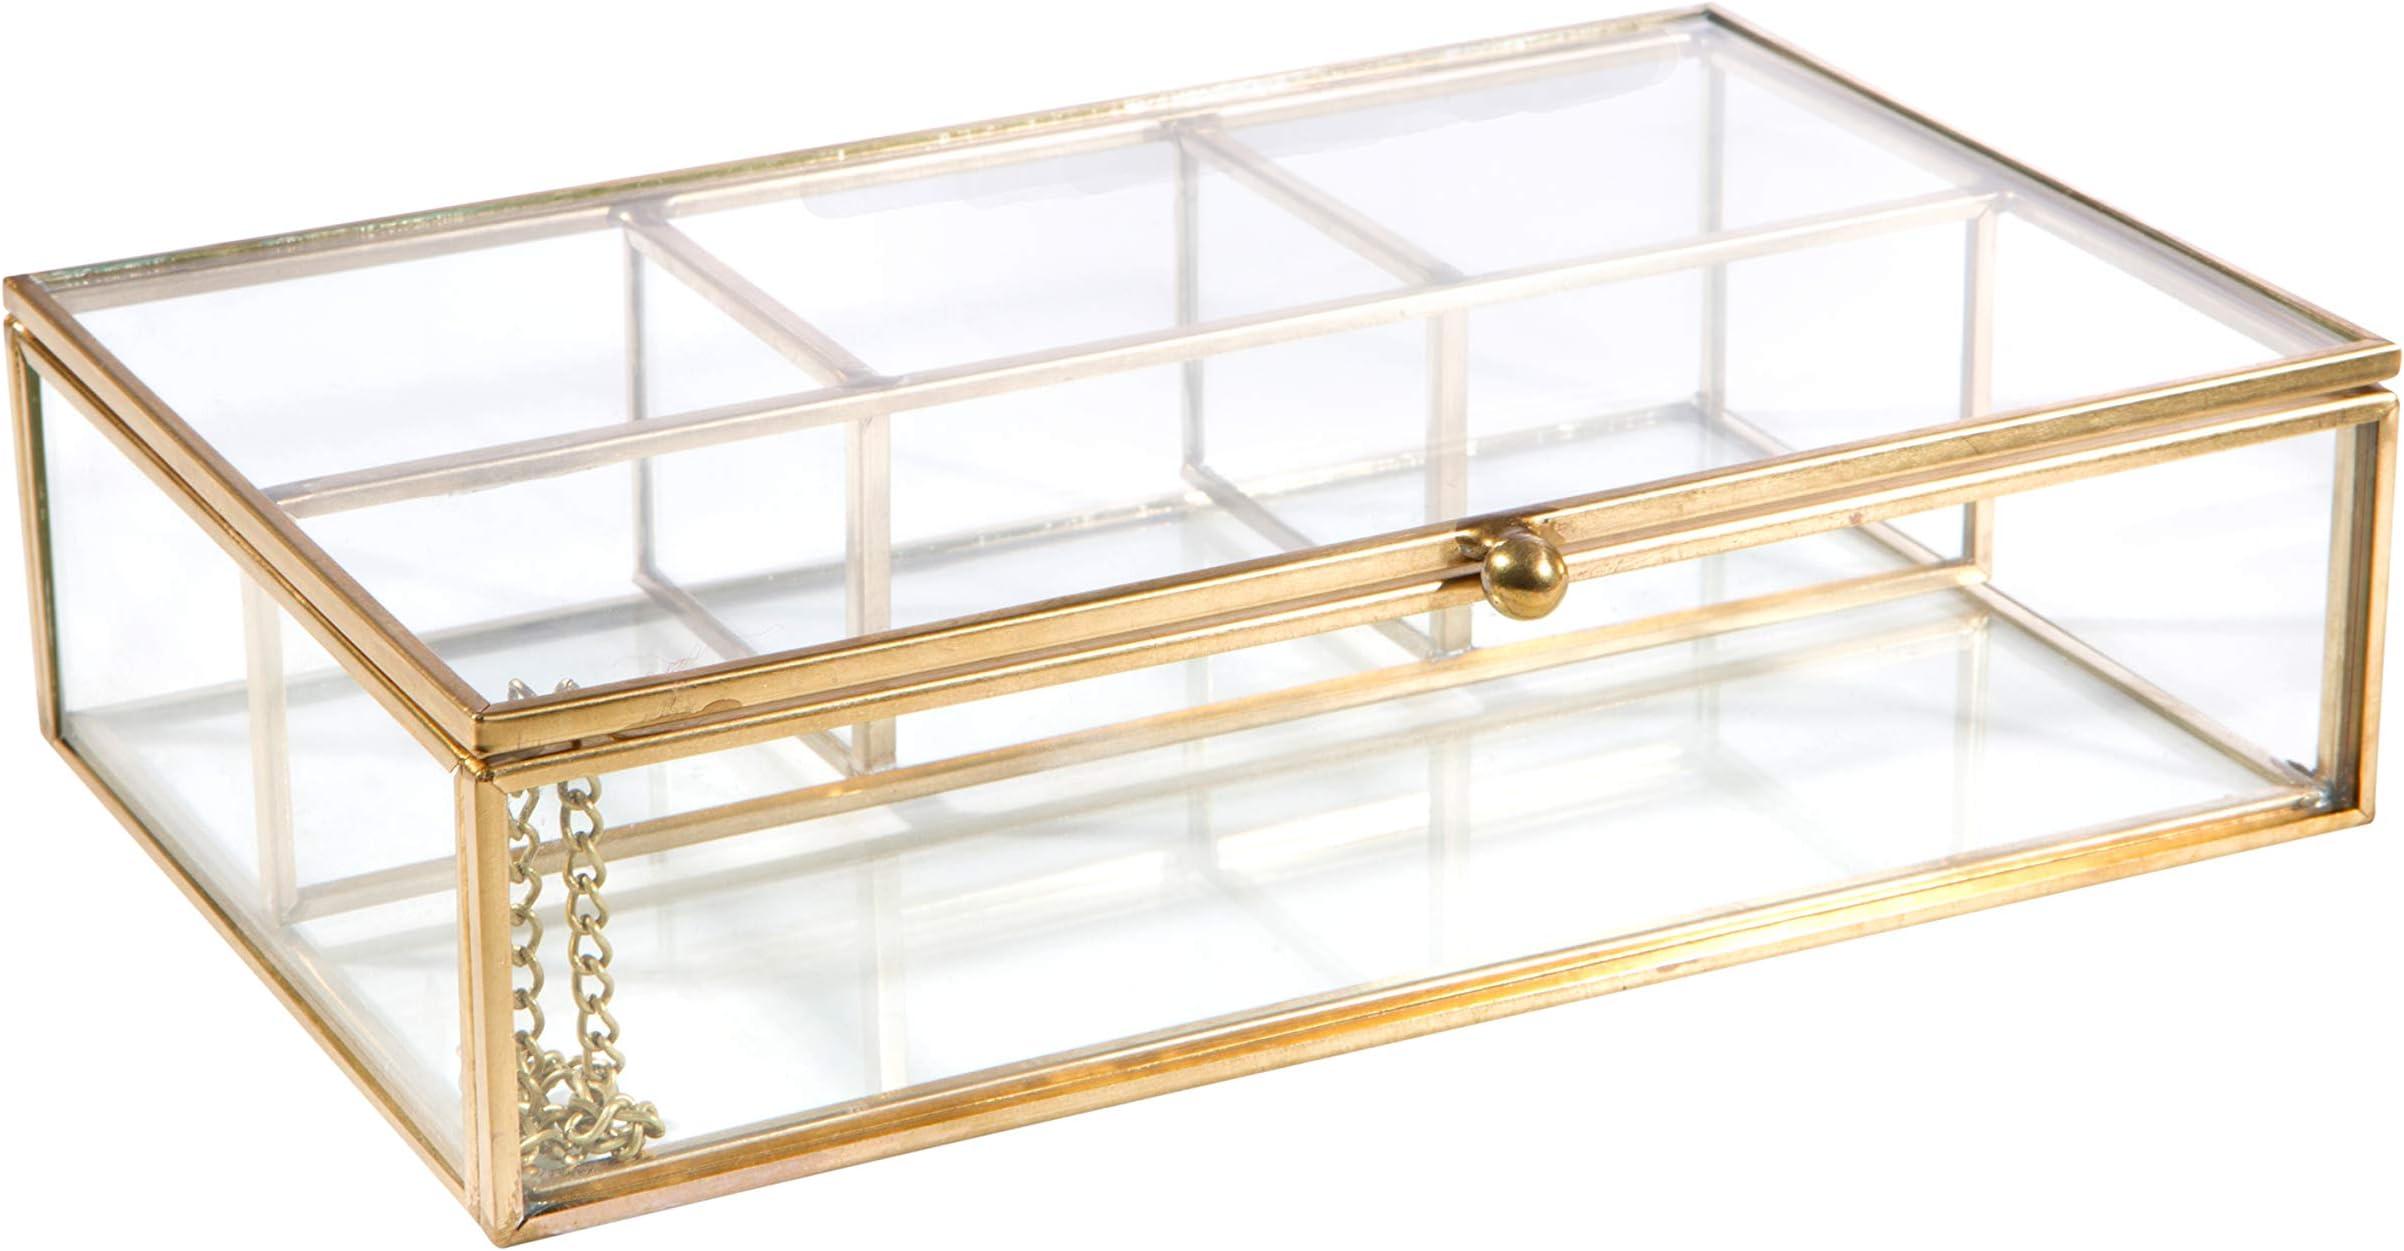 1049 Vintage 1940s era Gold Die Cast Floral Themed Jewellery Keepsake Box w Hinged Lid